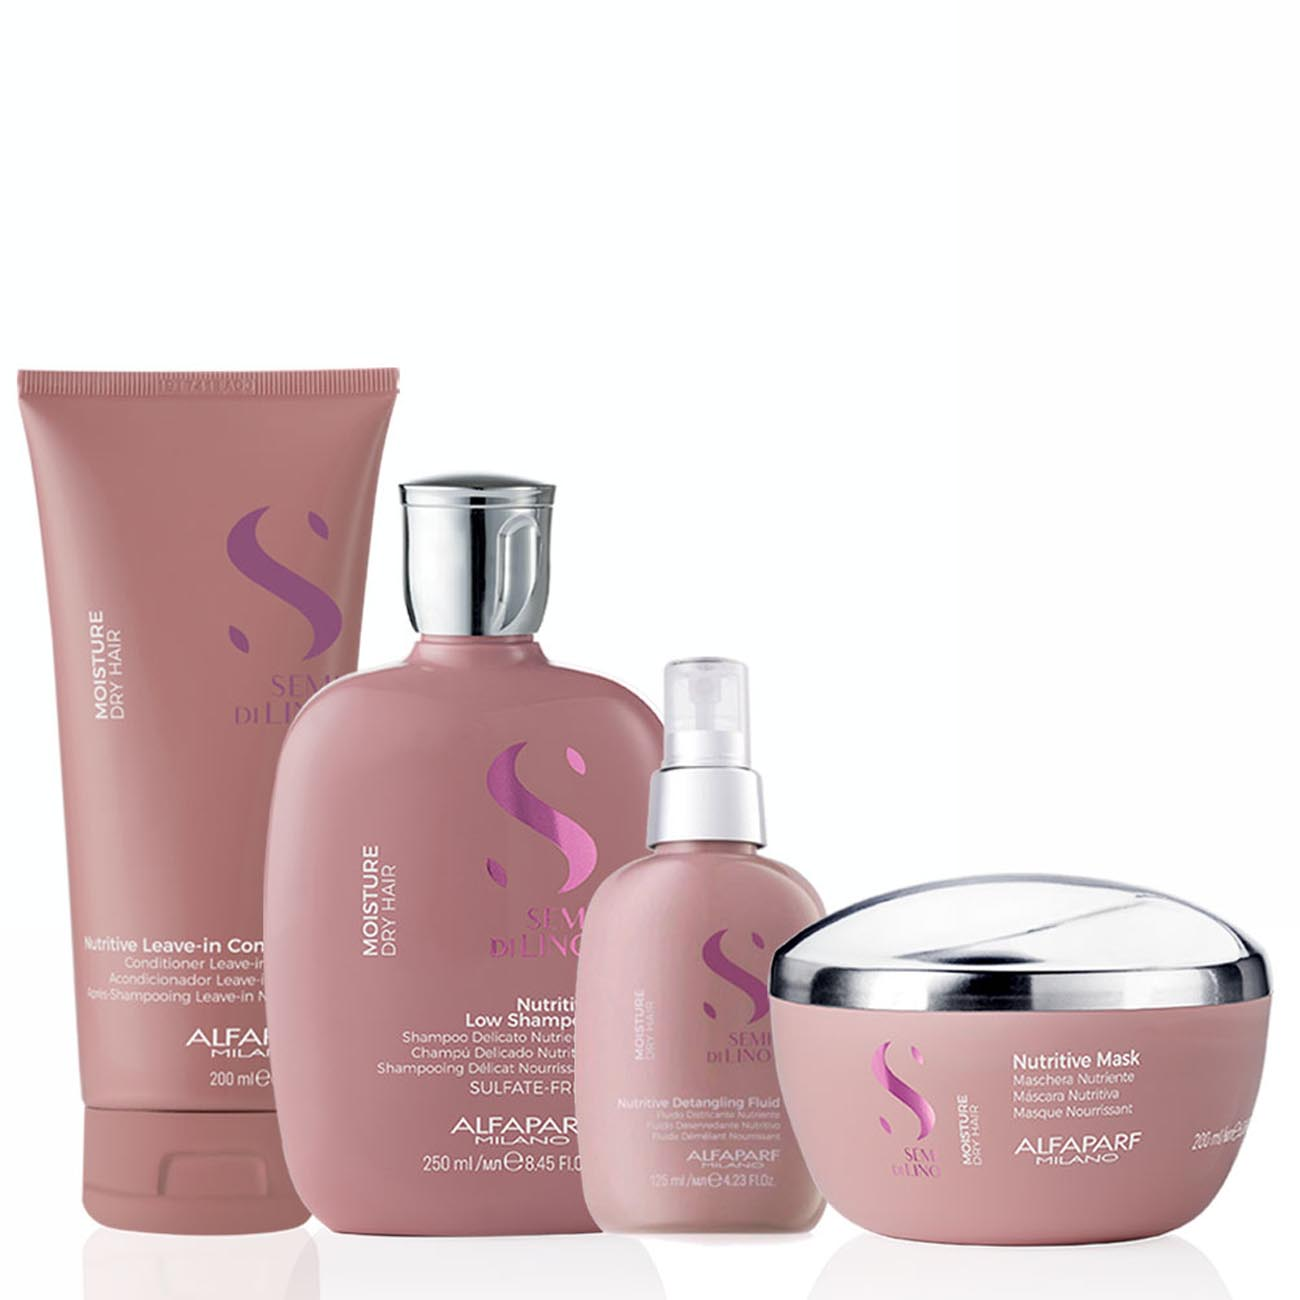 Alfaparf Milano Semi Di LINO Moisture Dry Hair Nutritive Kit Home Care Completo